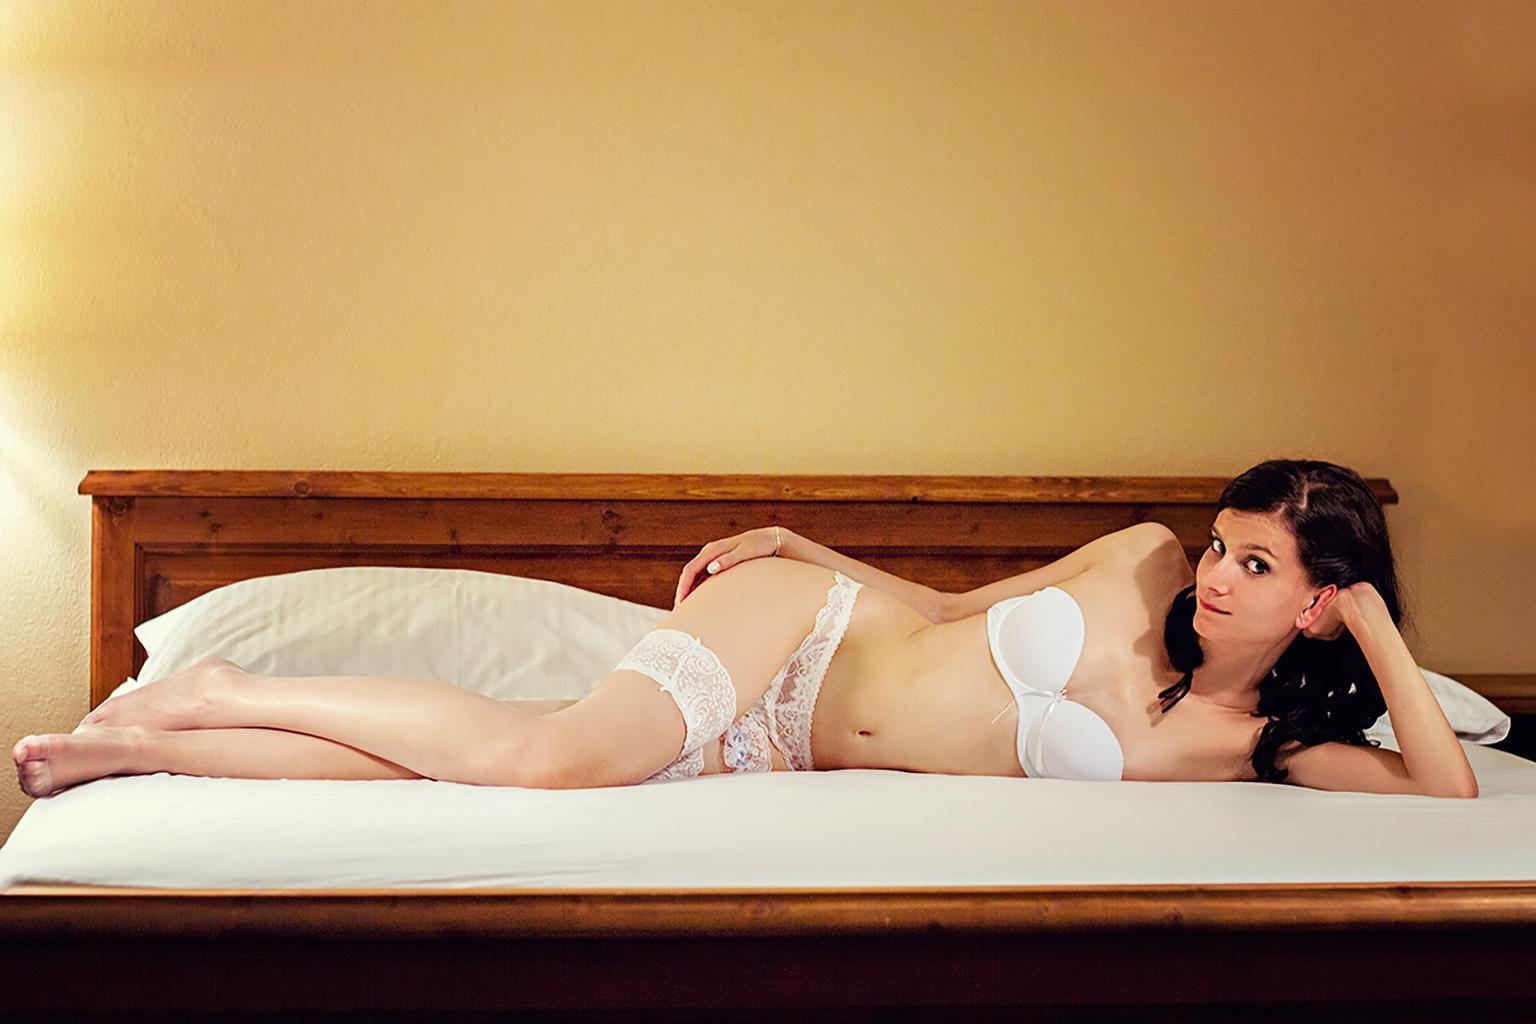 žena na posteli, erotika